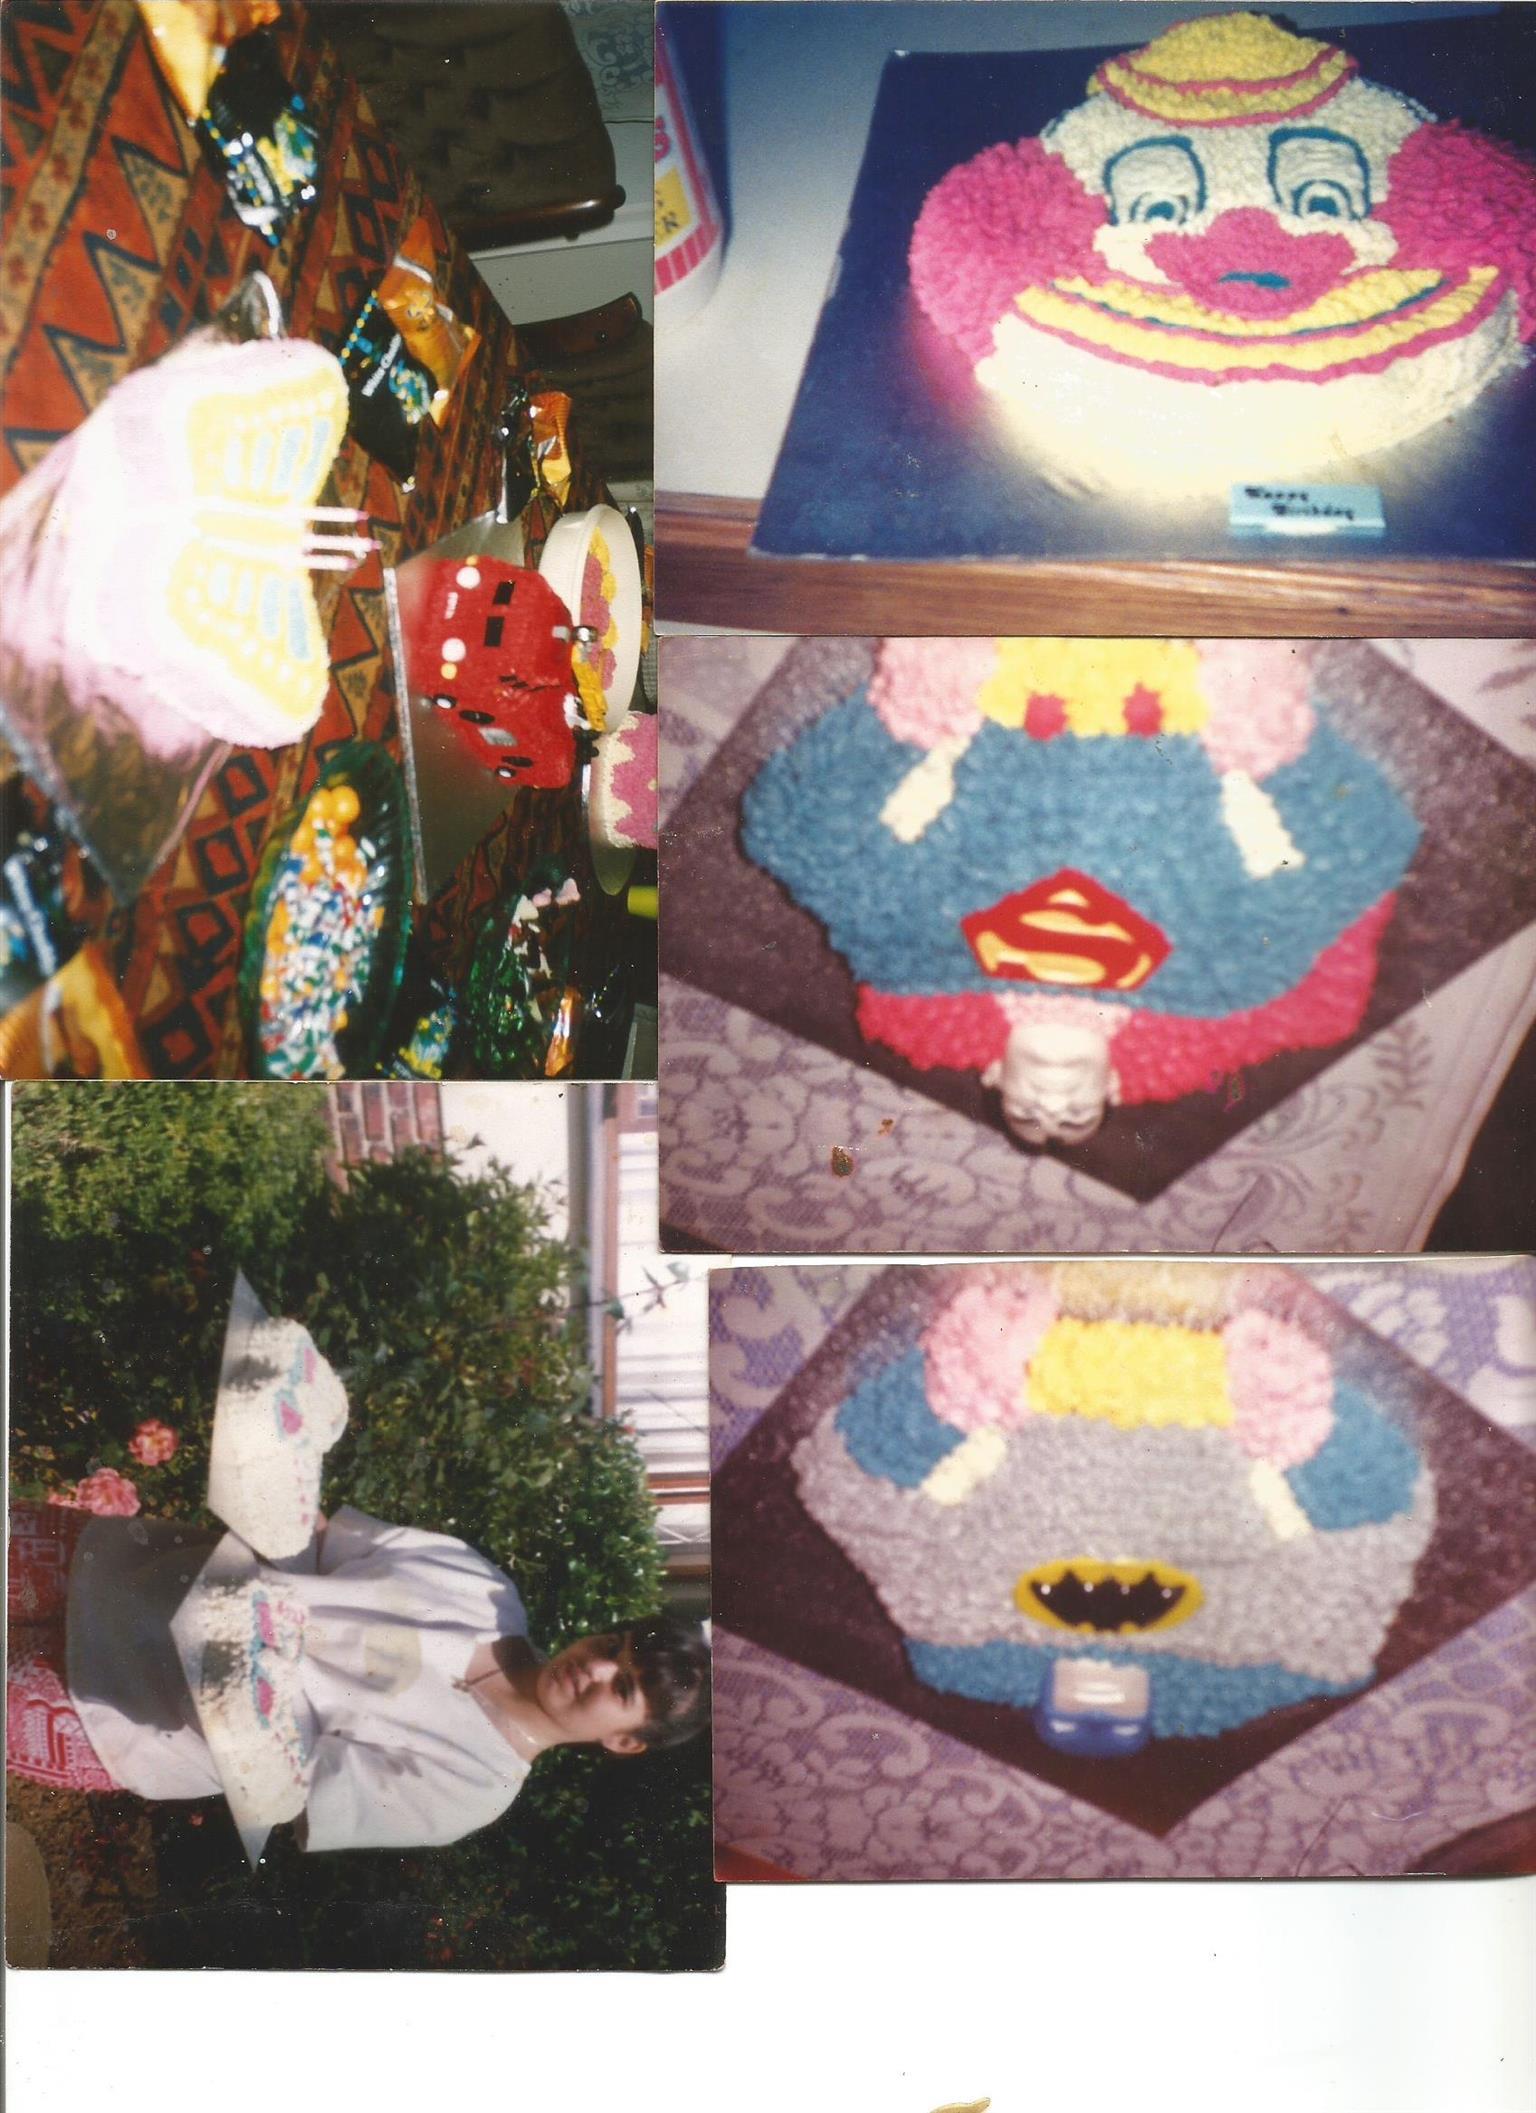 Molds for decorative cakes including Super man, Batman, Clowns & Butterflies